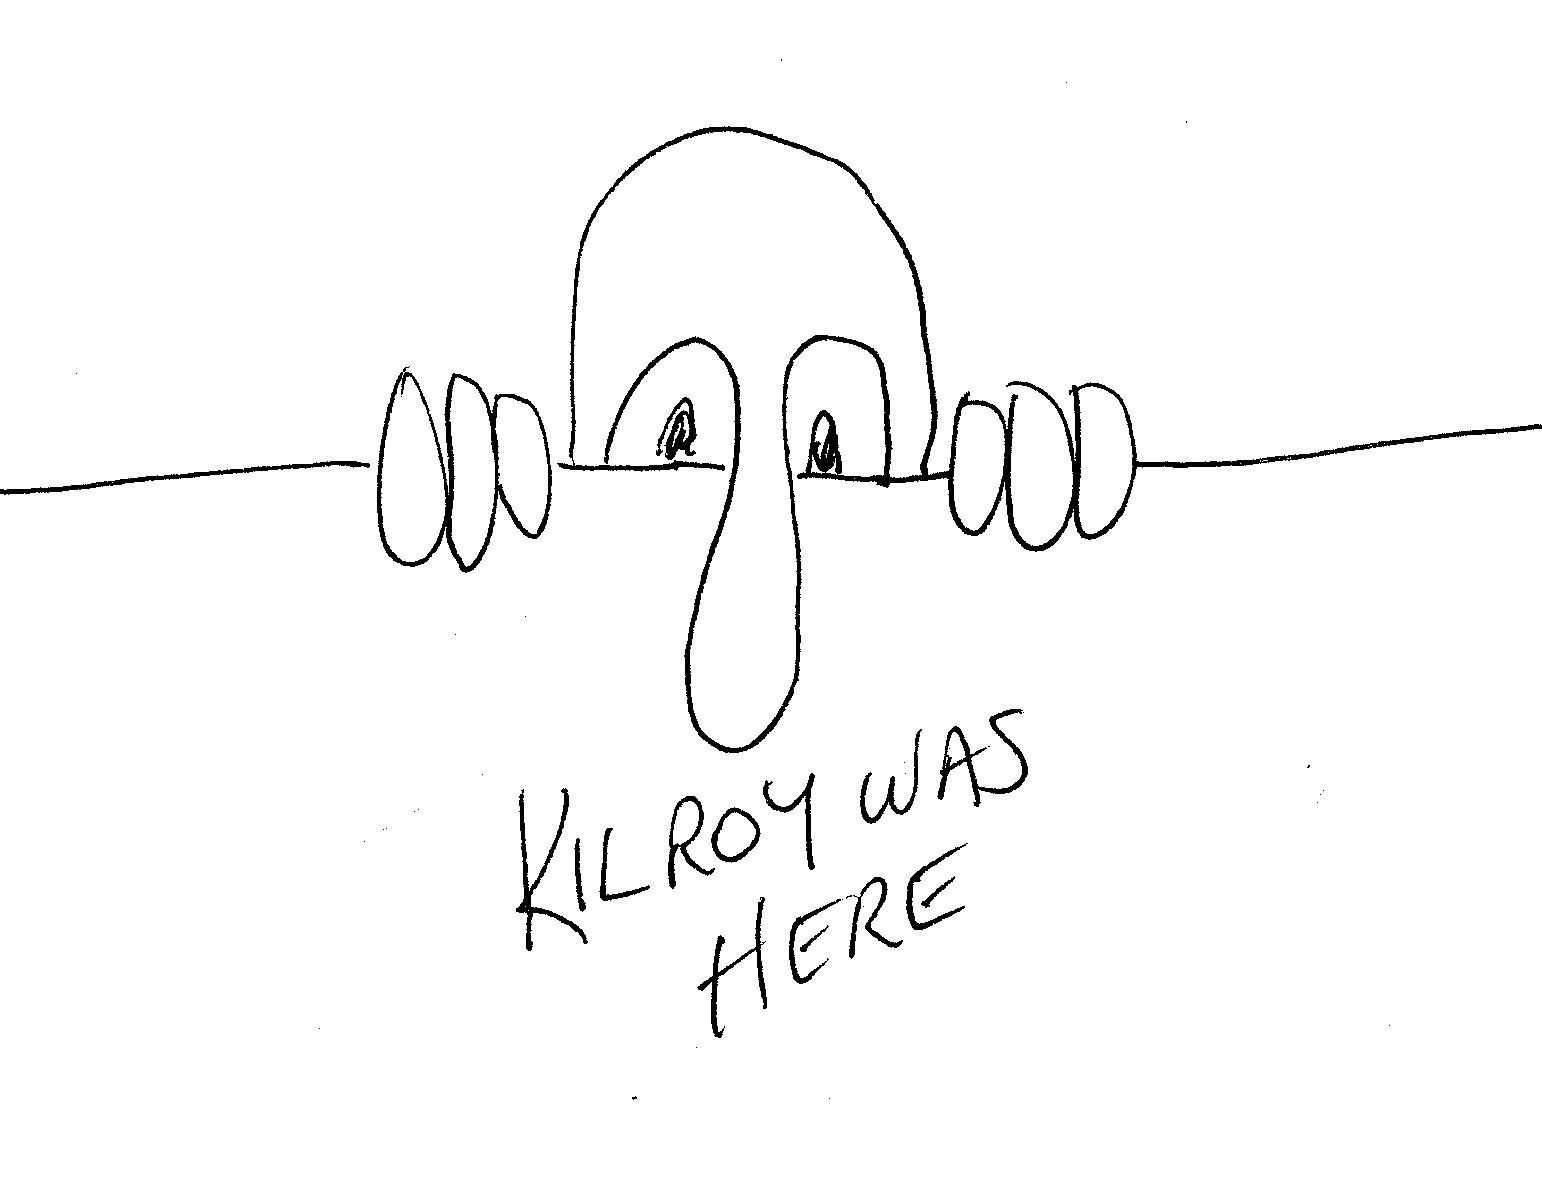 Kilroy-Was-Here.jpg